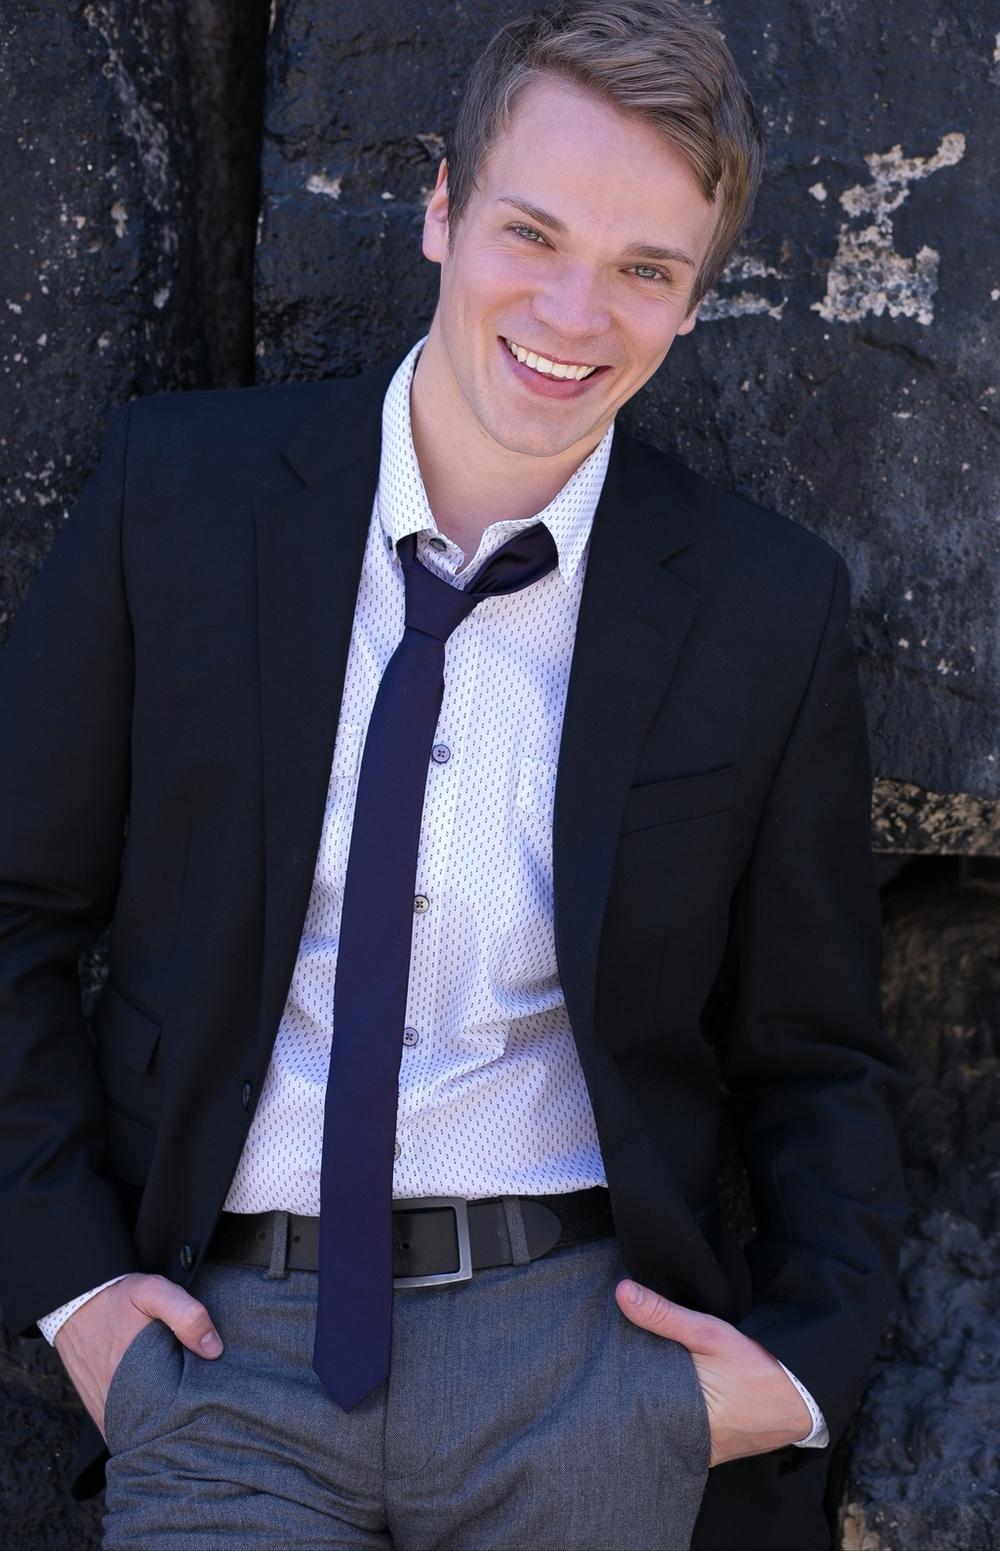 Nick Vidal